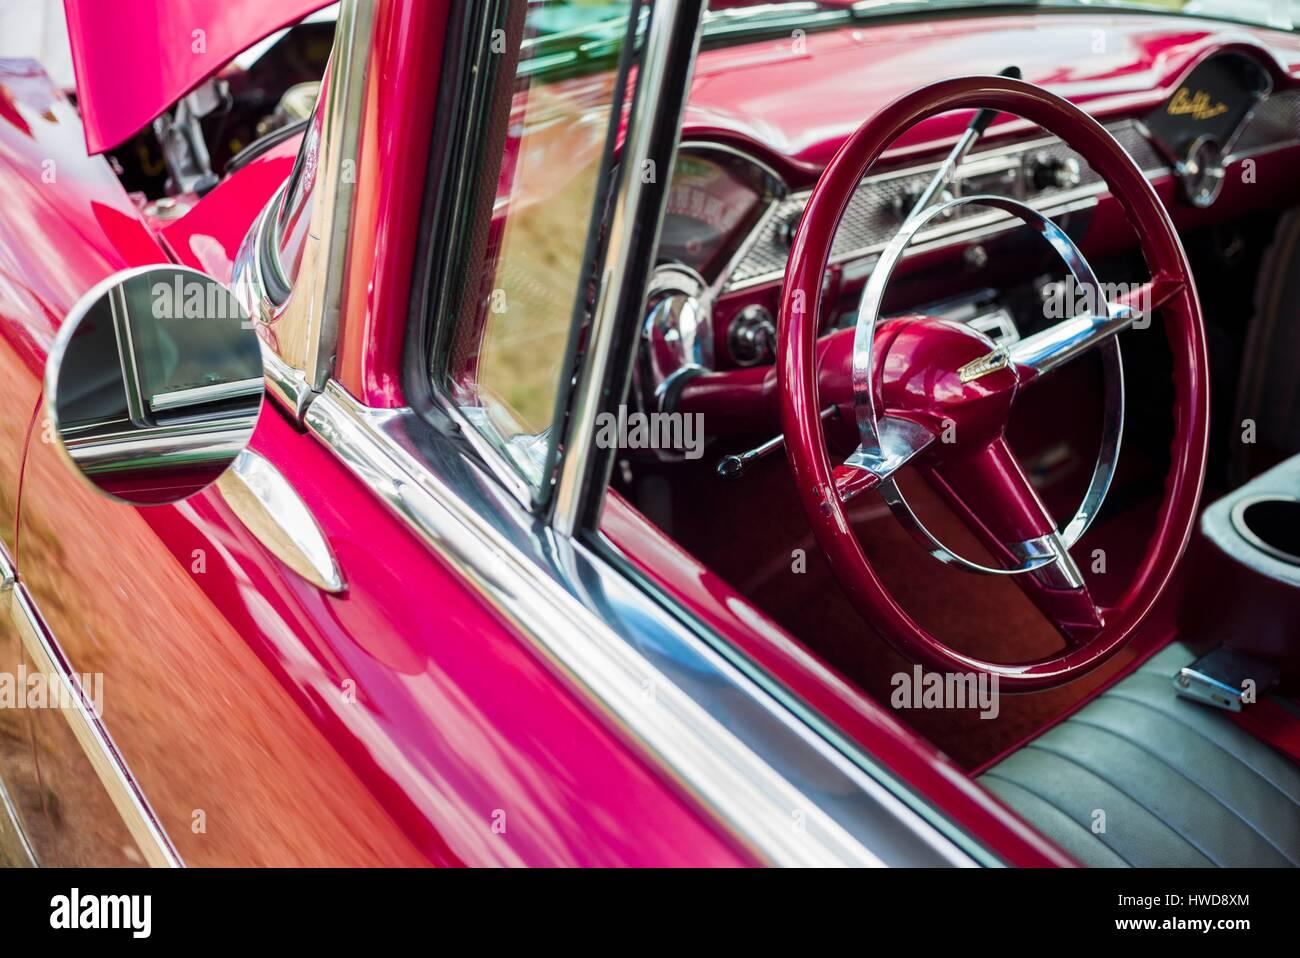 Nice Massachusetts Car Shows Gallery - Classic Cars Ideas - boiq.info